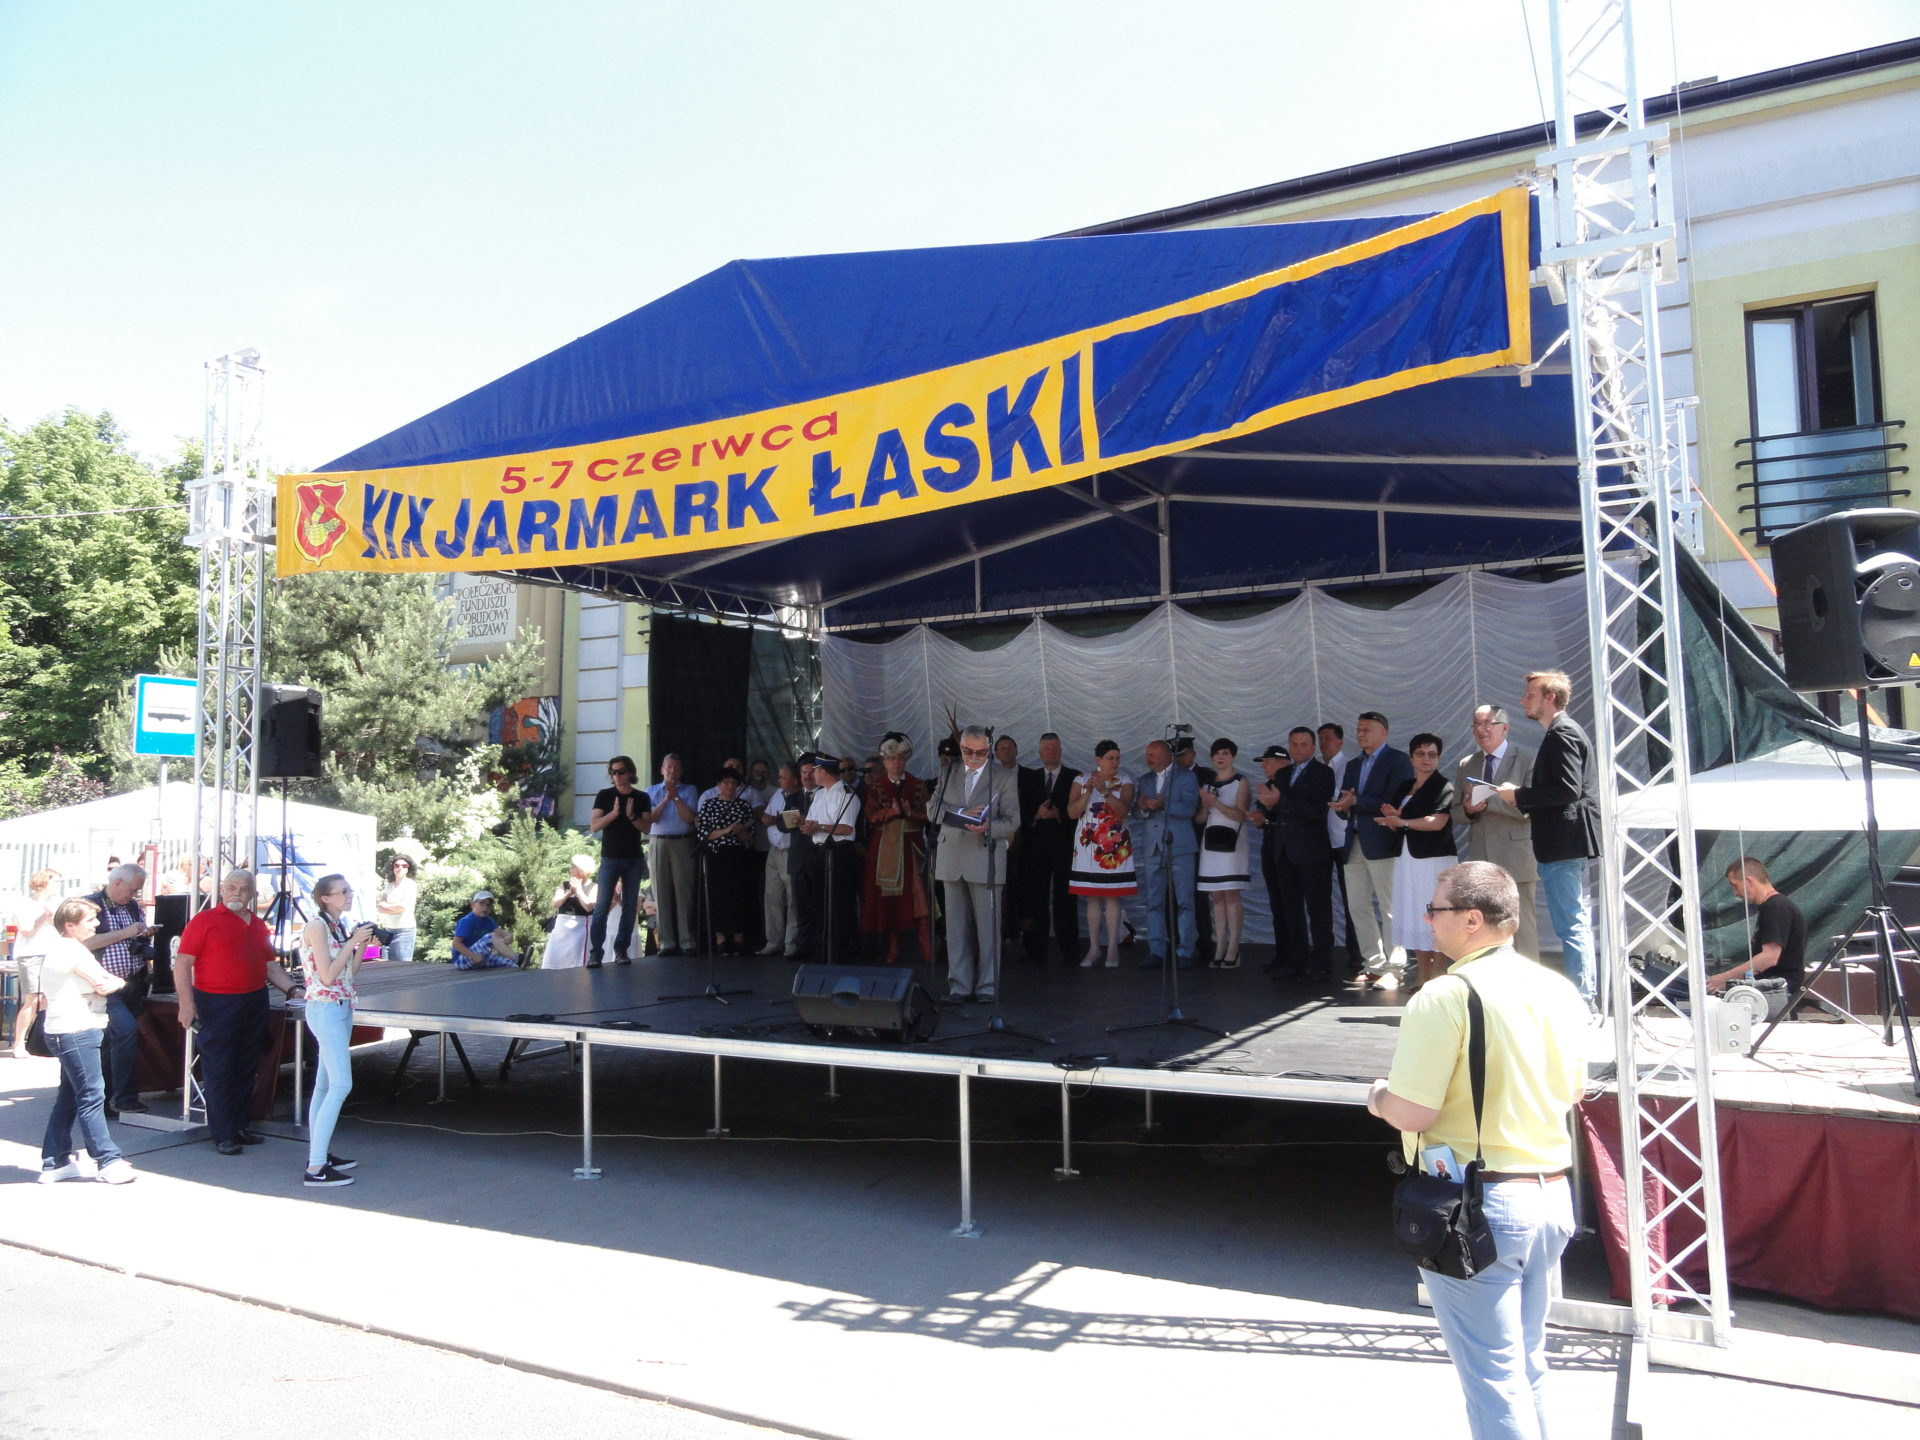 19. Jarmark Łaski